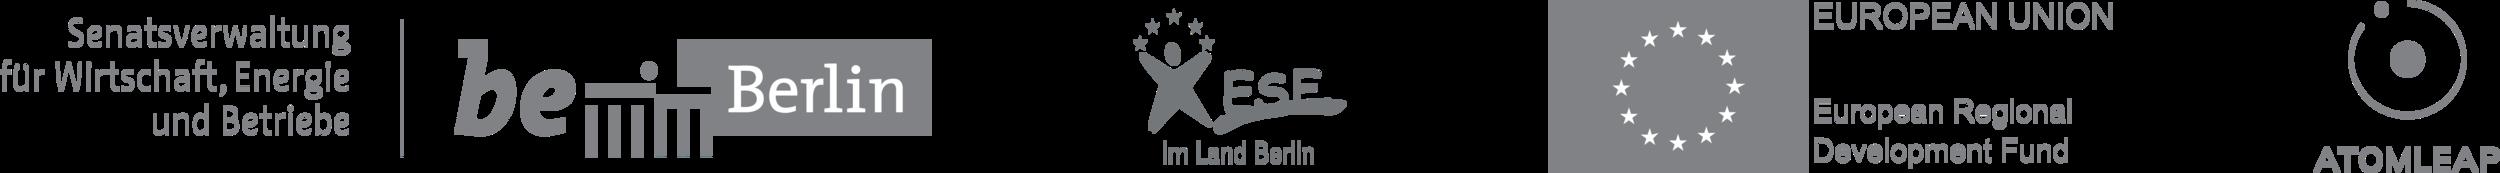 logos_grey_footer_ESF-2.png